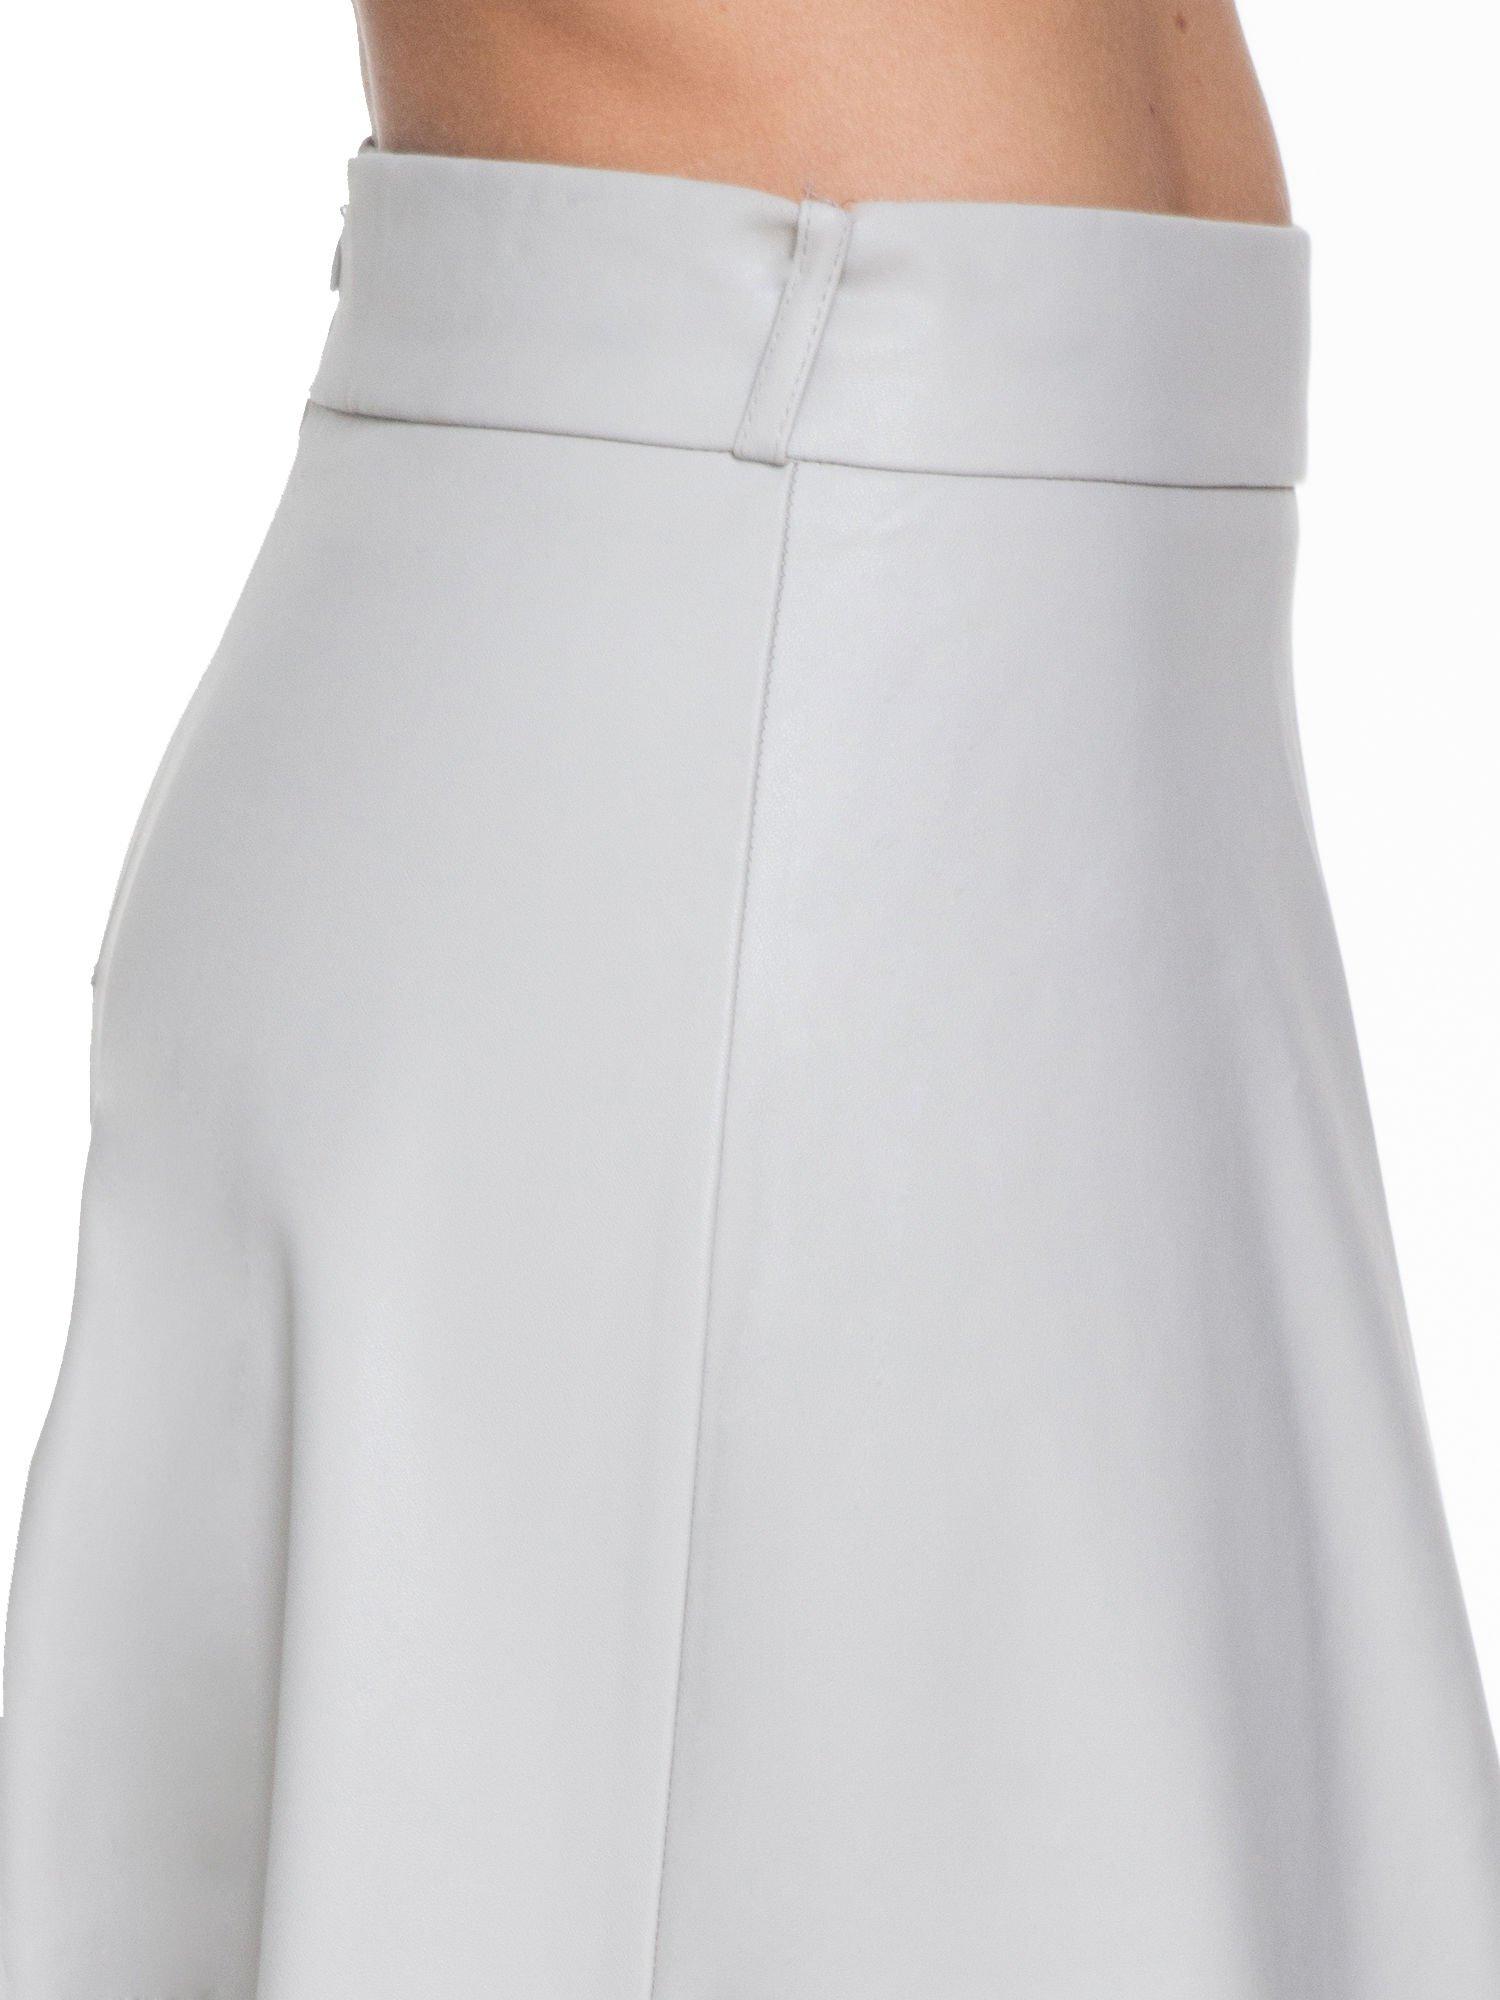 Szara skórzana spódnica midi szyta z półkola                                  zdj.                                  5